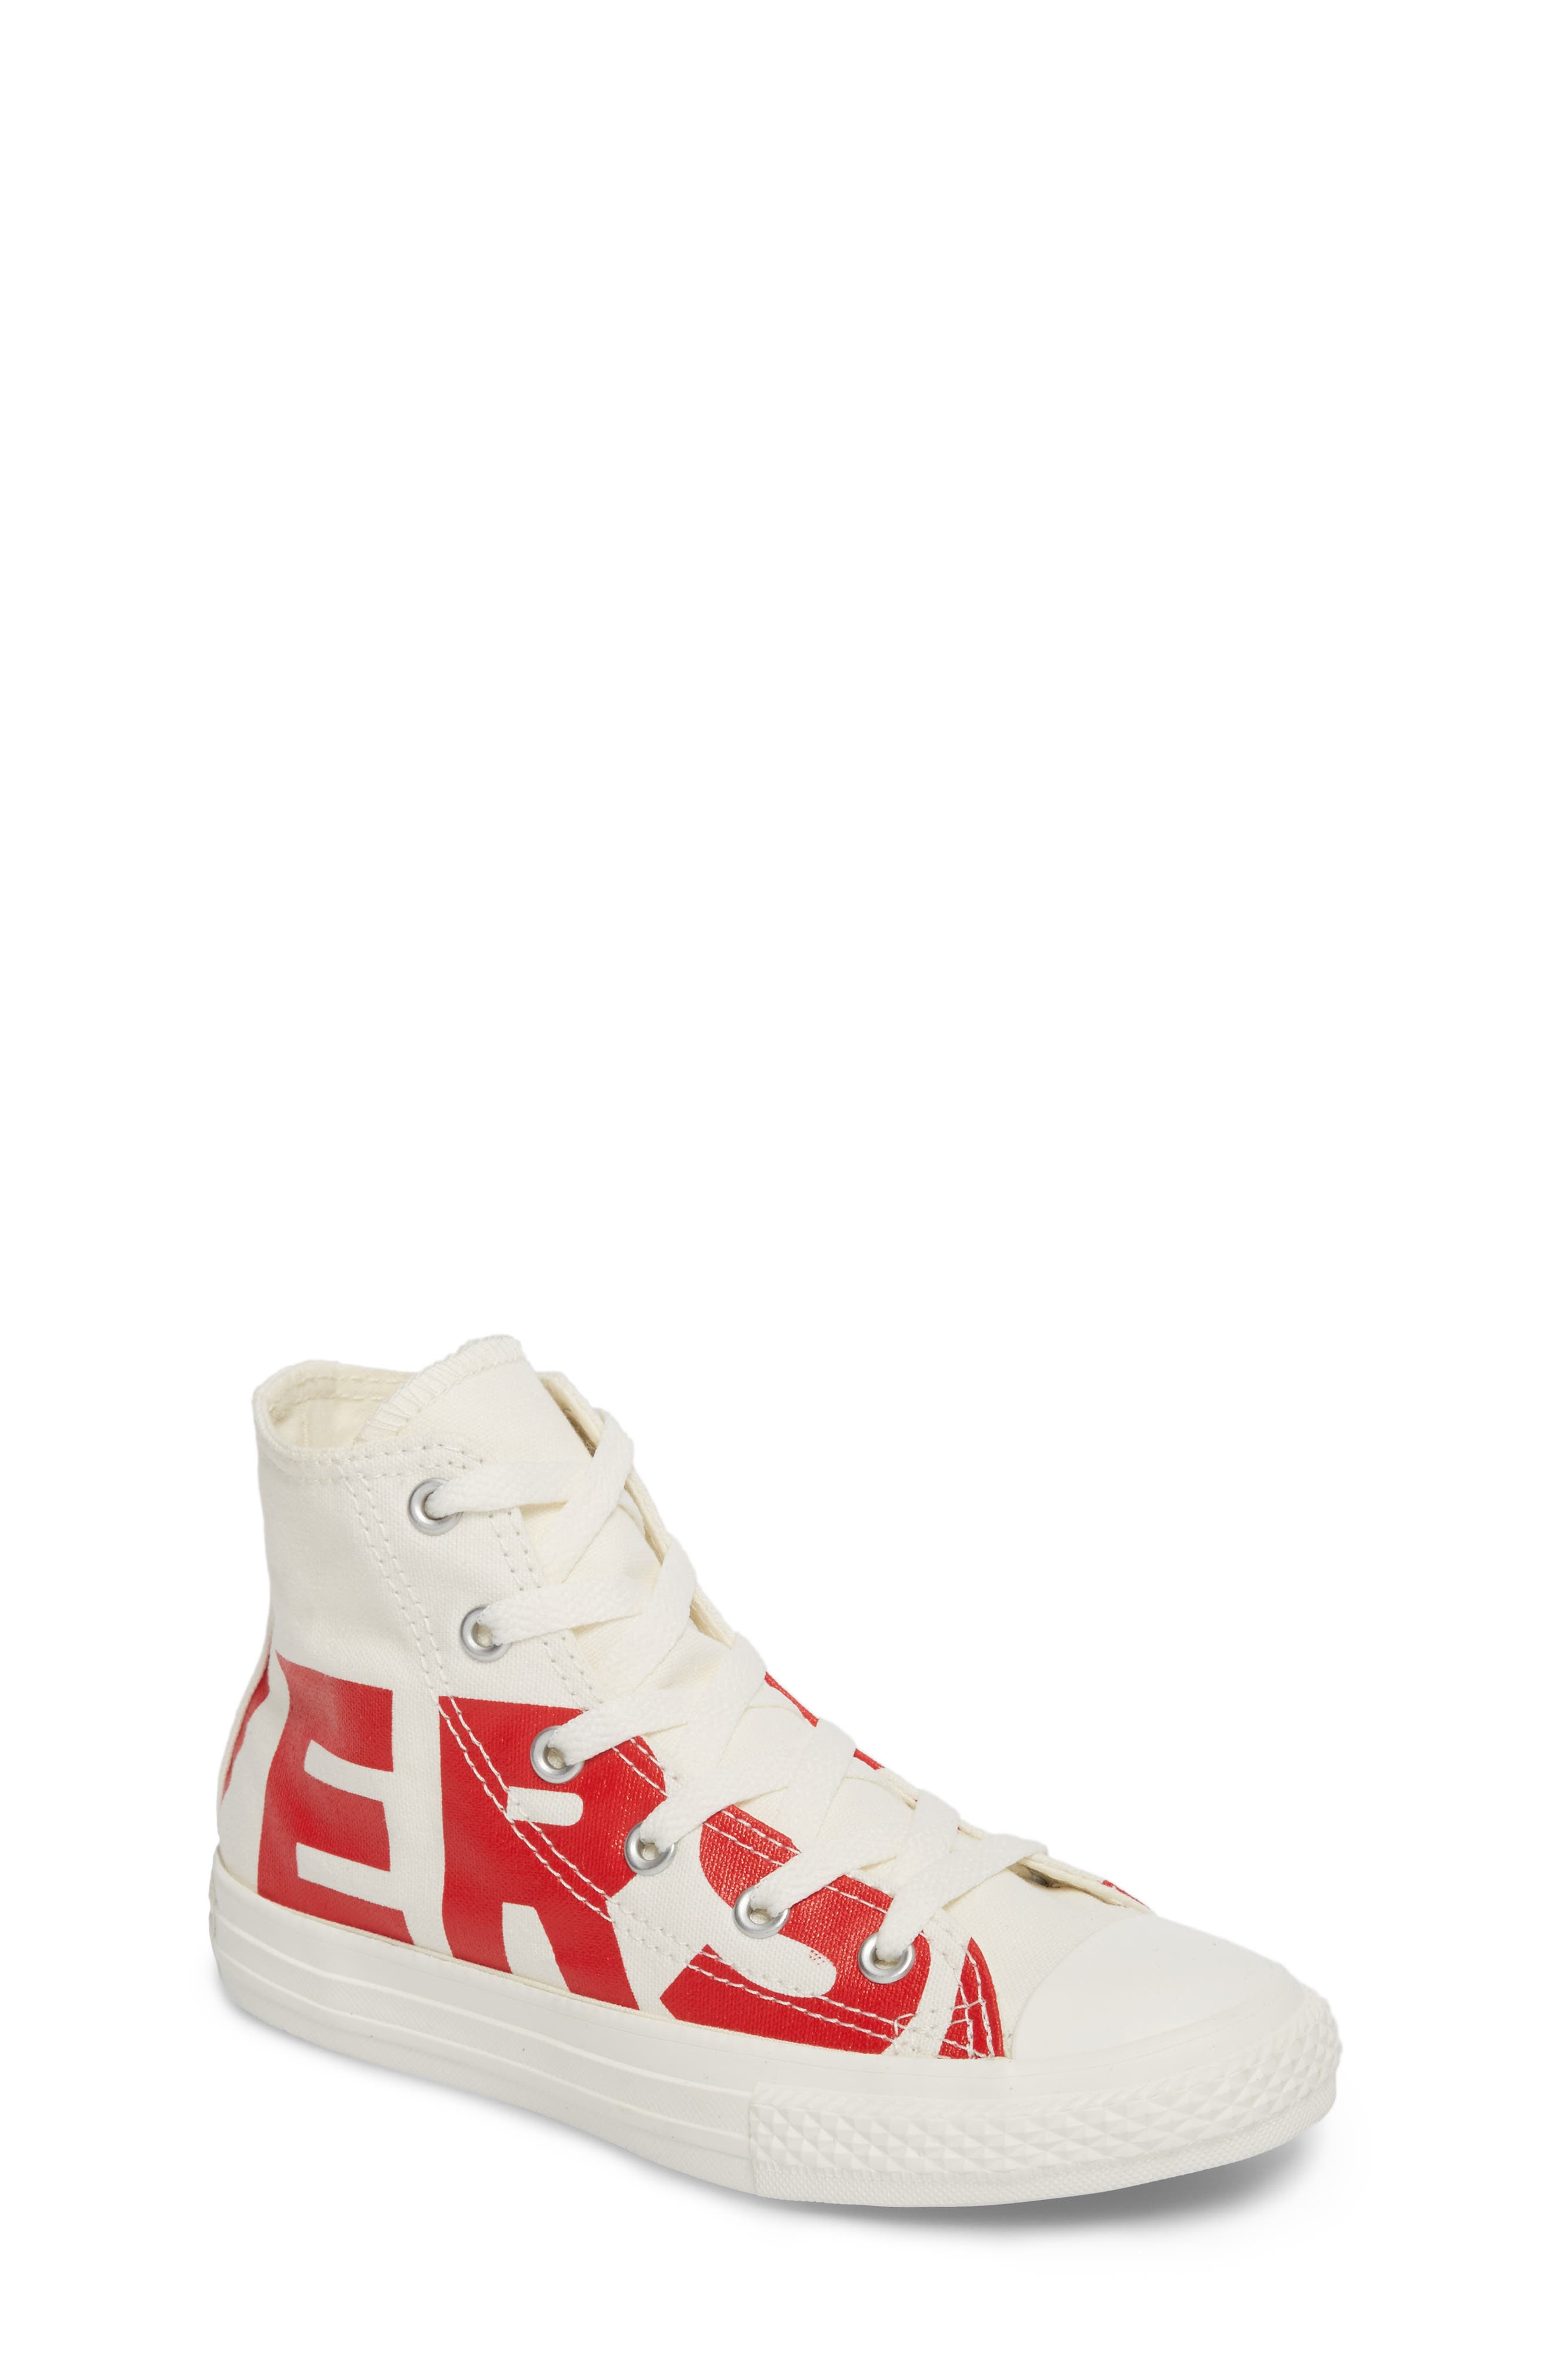 Chuck Taylor<sup>®</sup> All Star<sup>®</sup> Wordmark Hi Sneaker,                             Main thumbnail 1, color,                             600